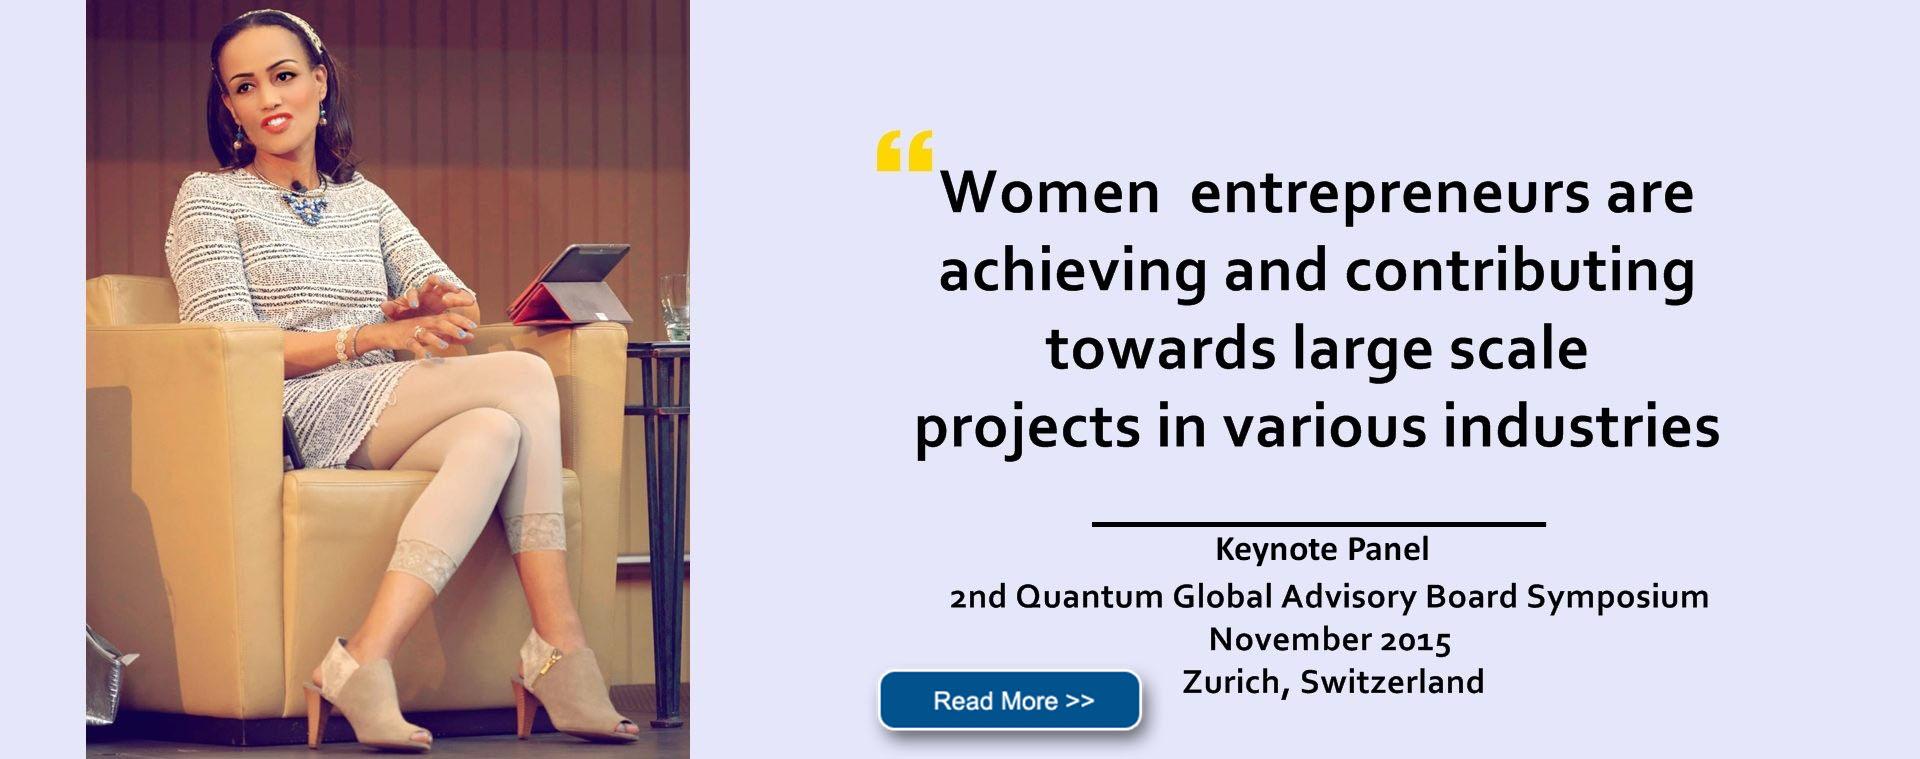 2nd Quantum Global Advisory Board Symposium, Zurich, Switzerland on 19th November 2015